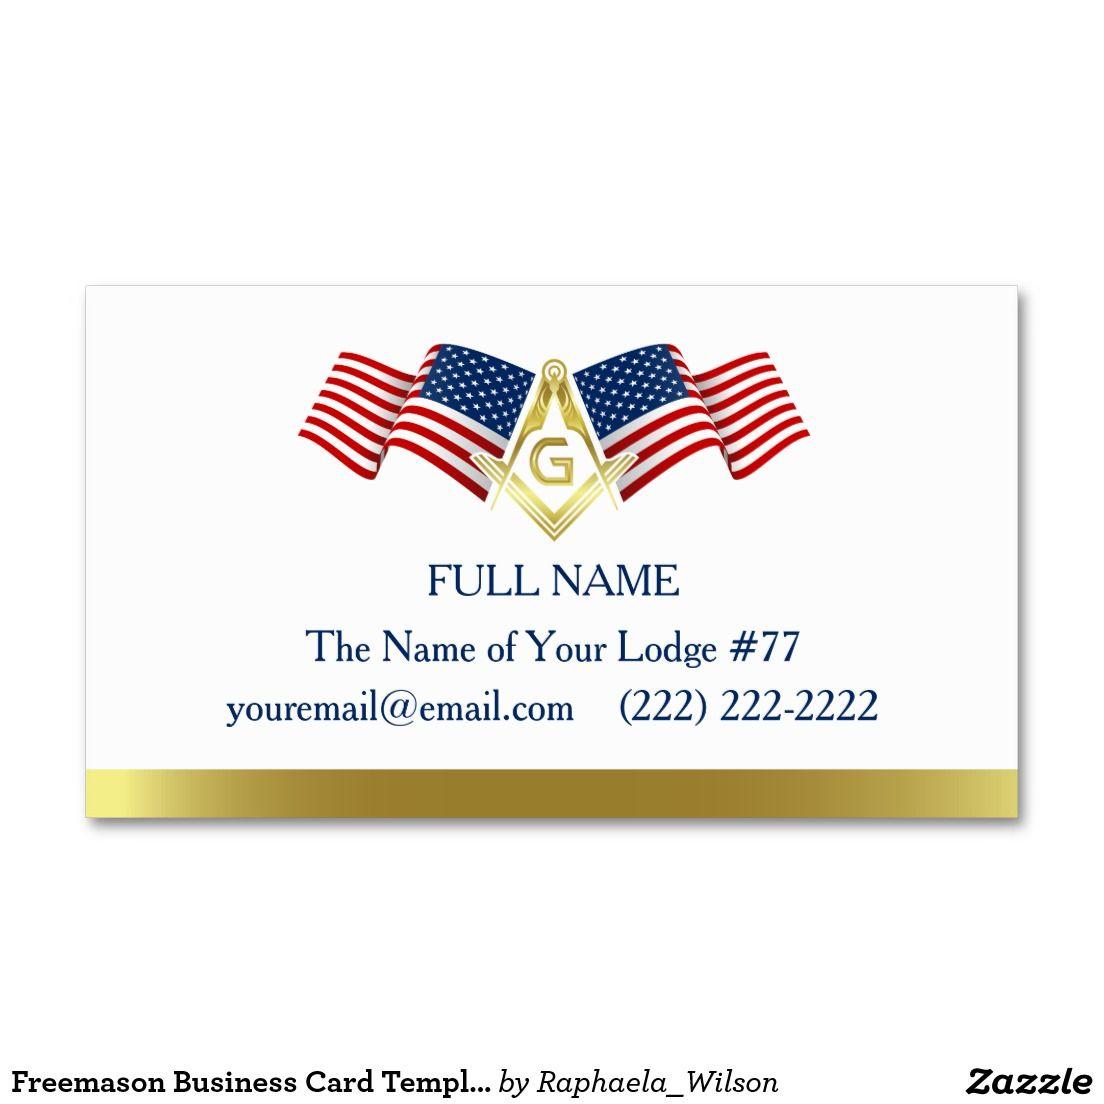 Freemason business card template american flag custom masonic freemason business card template american flag colourmoves